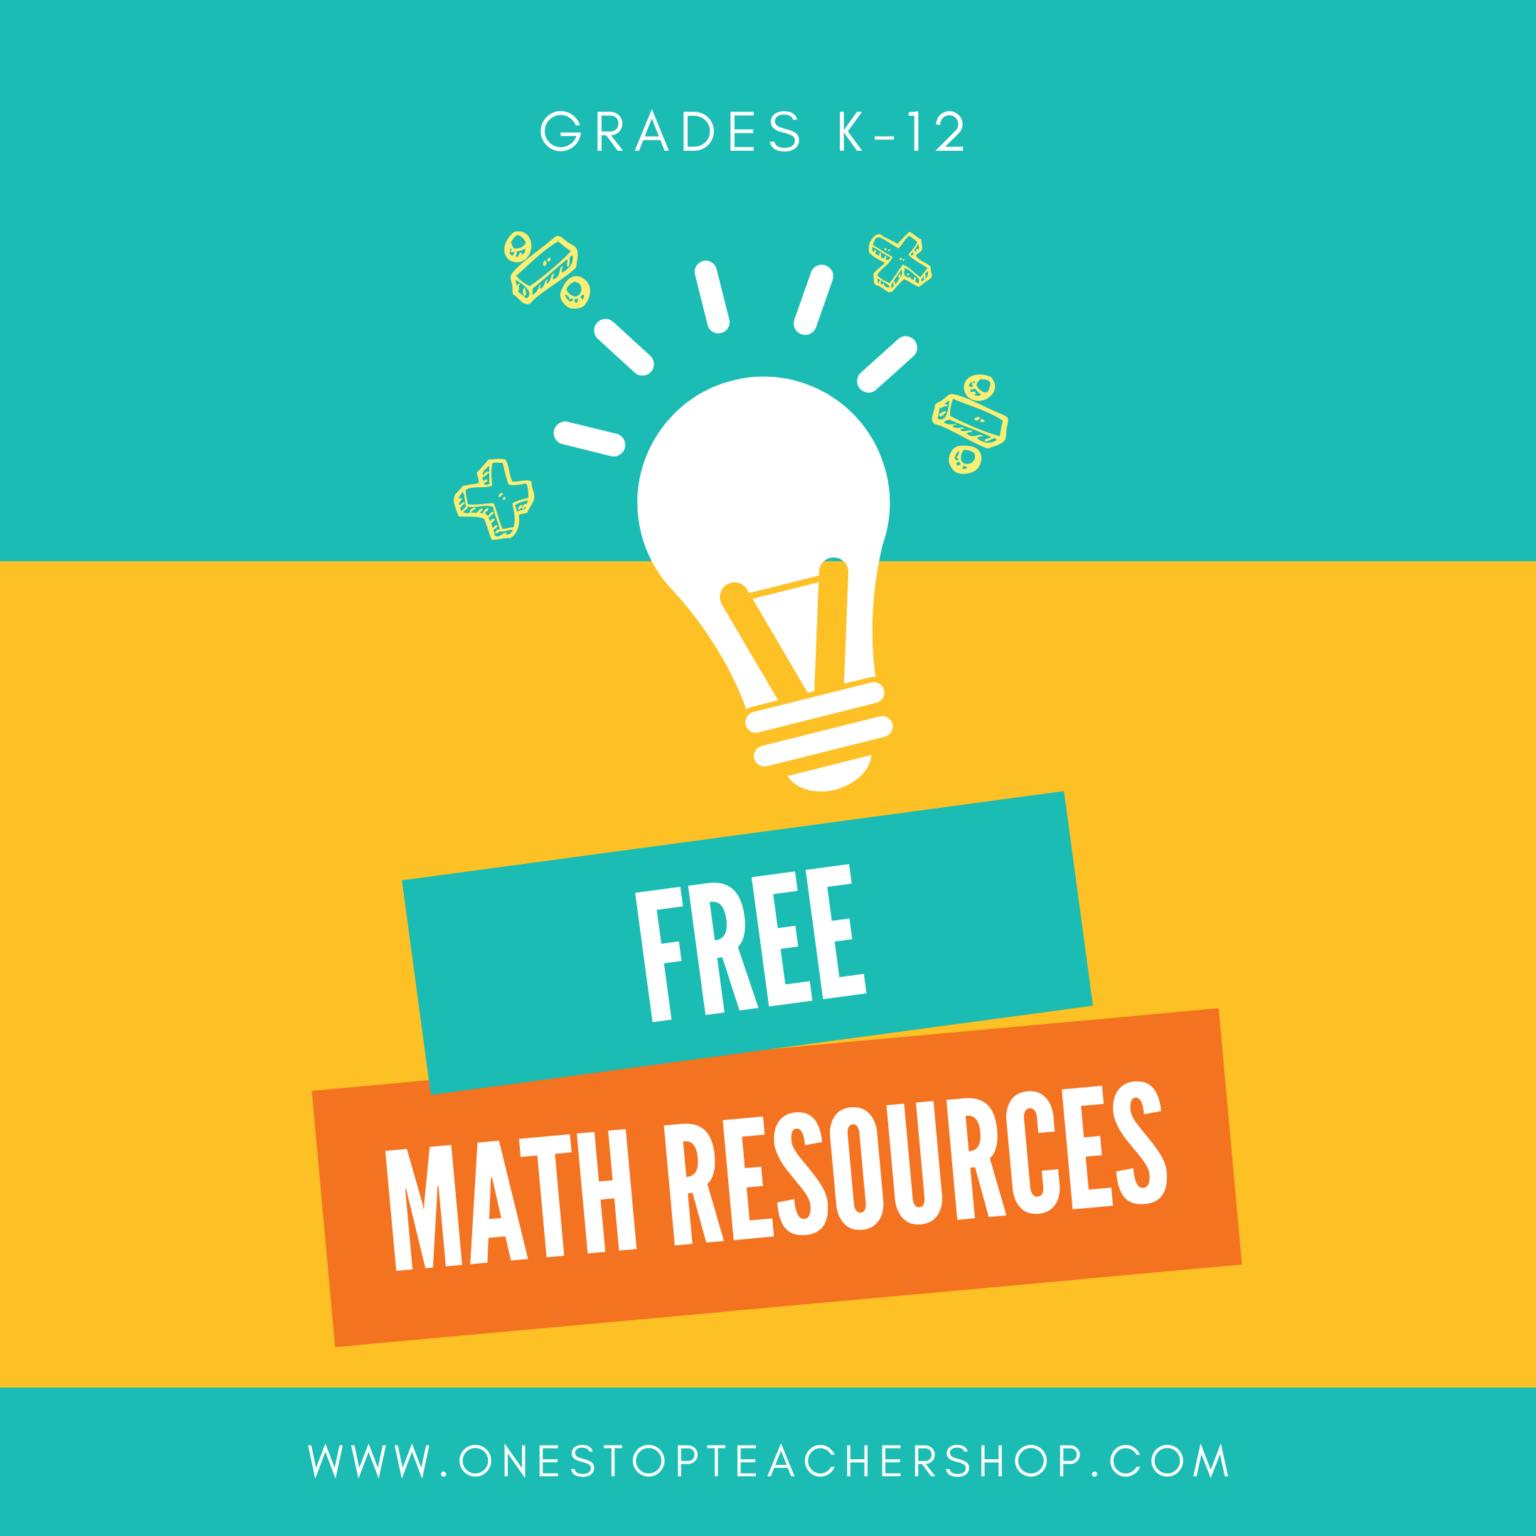 FREE Math Resources for Teachers One Stop Teacher Shop